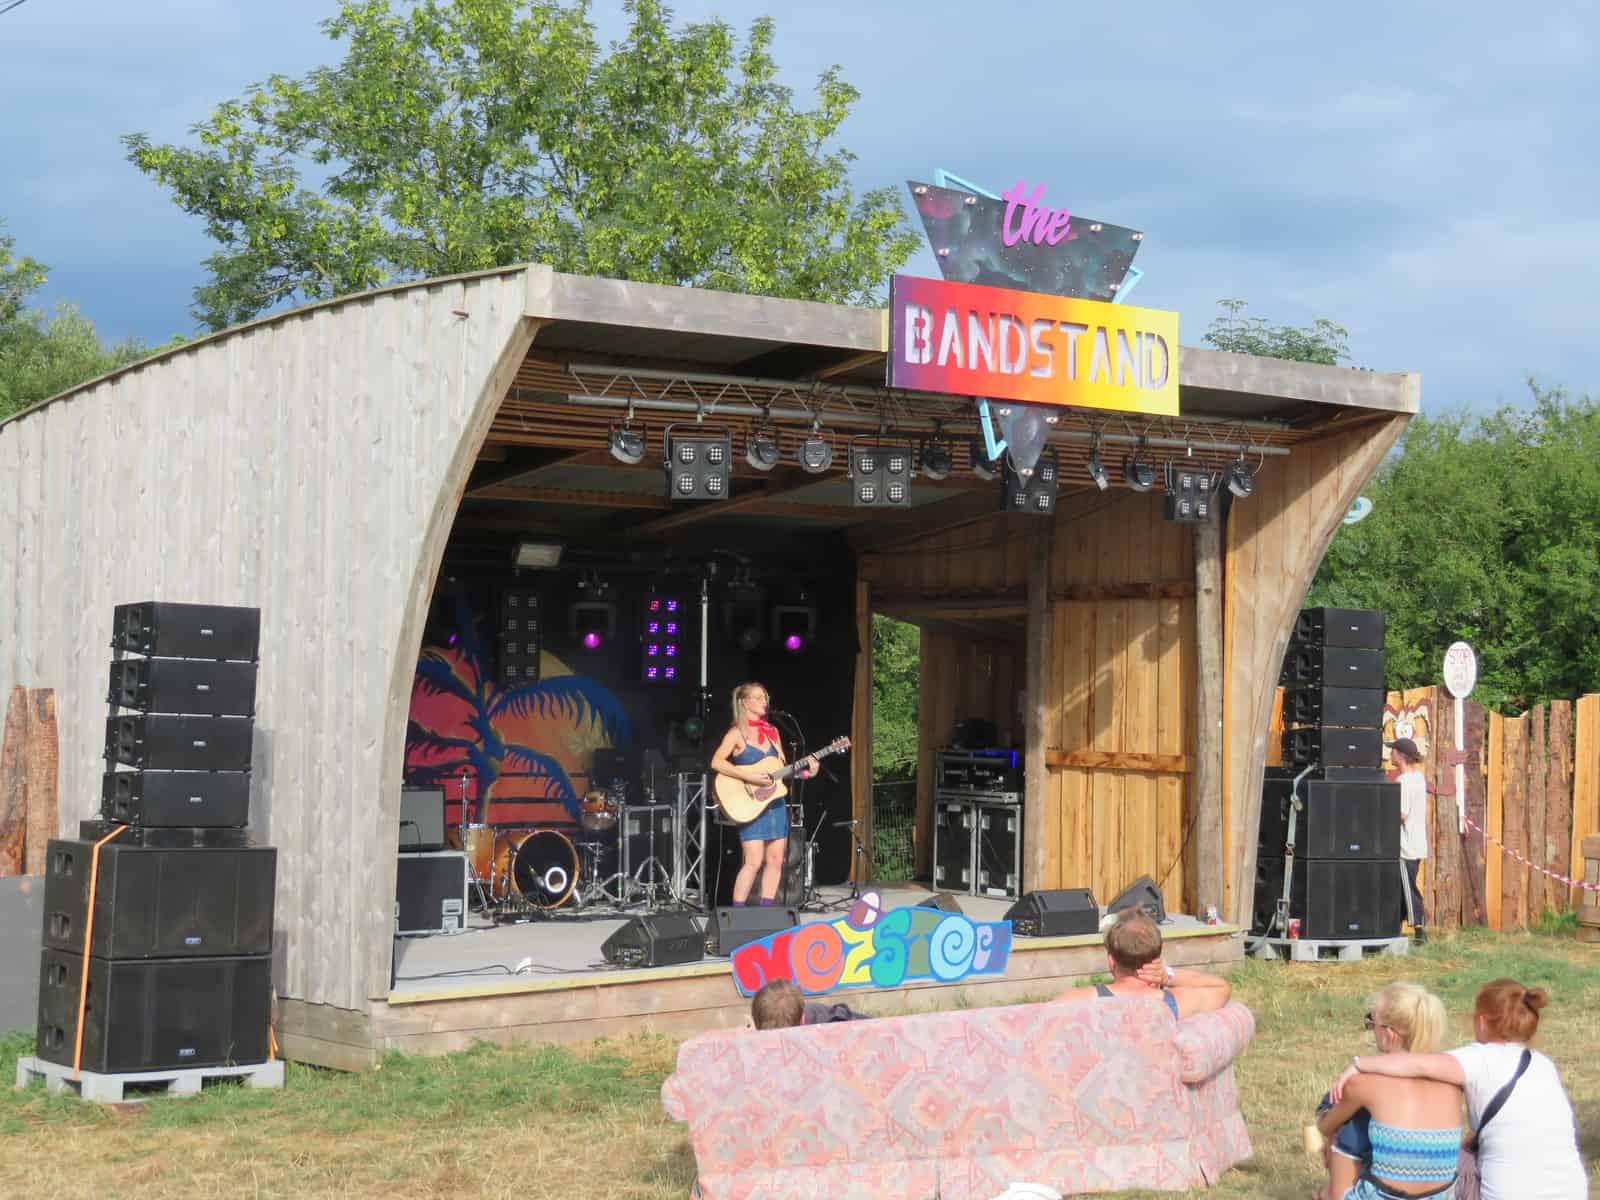 Nozstock the hidden valley festival - bandstand stage